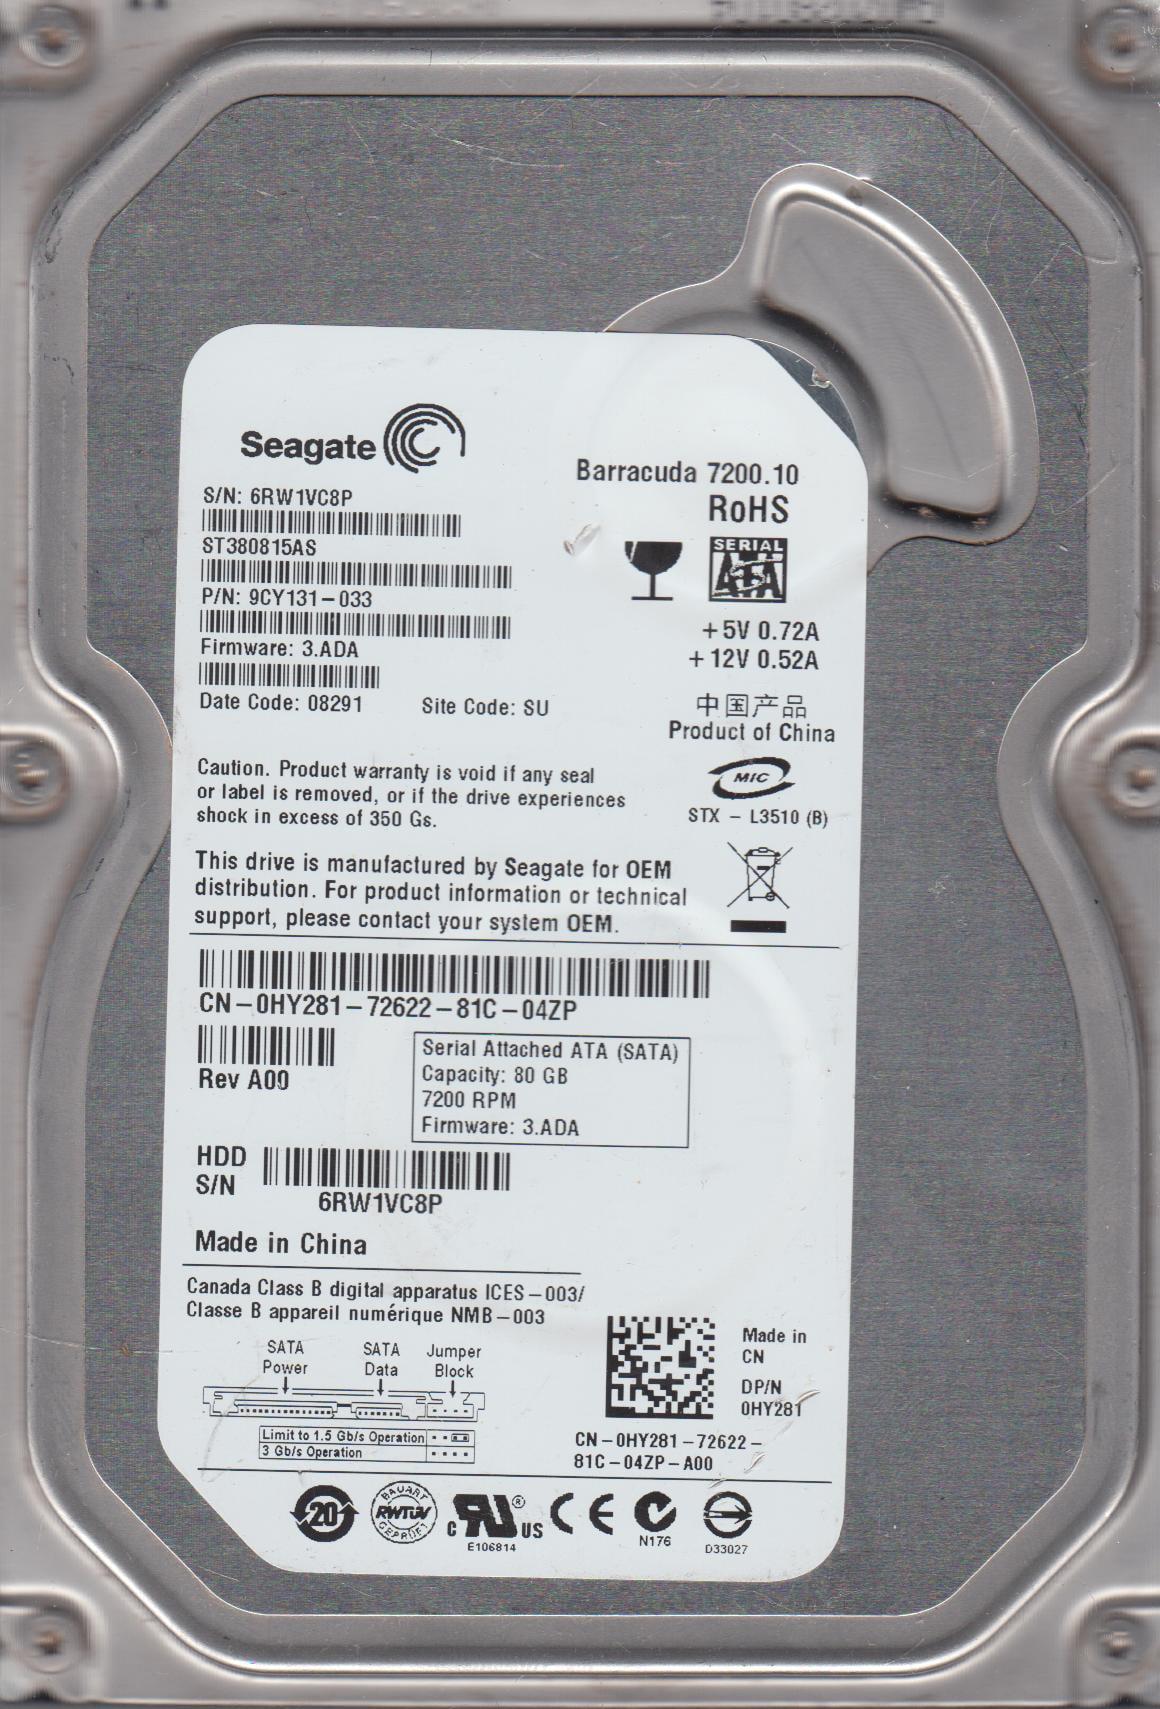 ST380815AS, 6RW, SU, PN 9CY131-033, FW 3.ADA, Seagate 80GB SATA 3.5 Hard Drive by Seagate